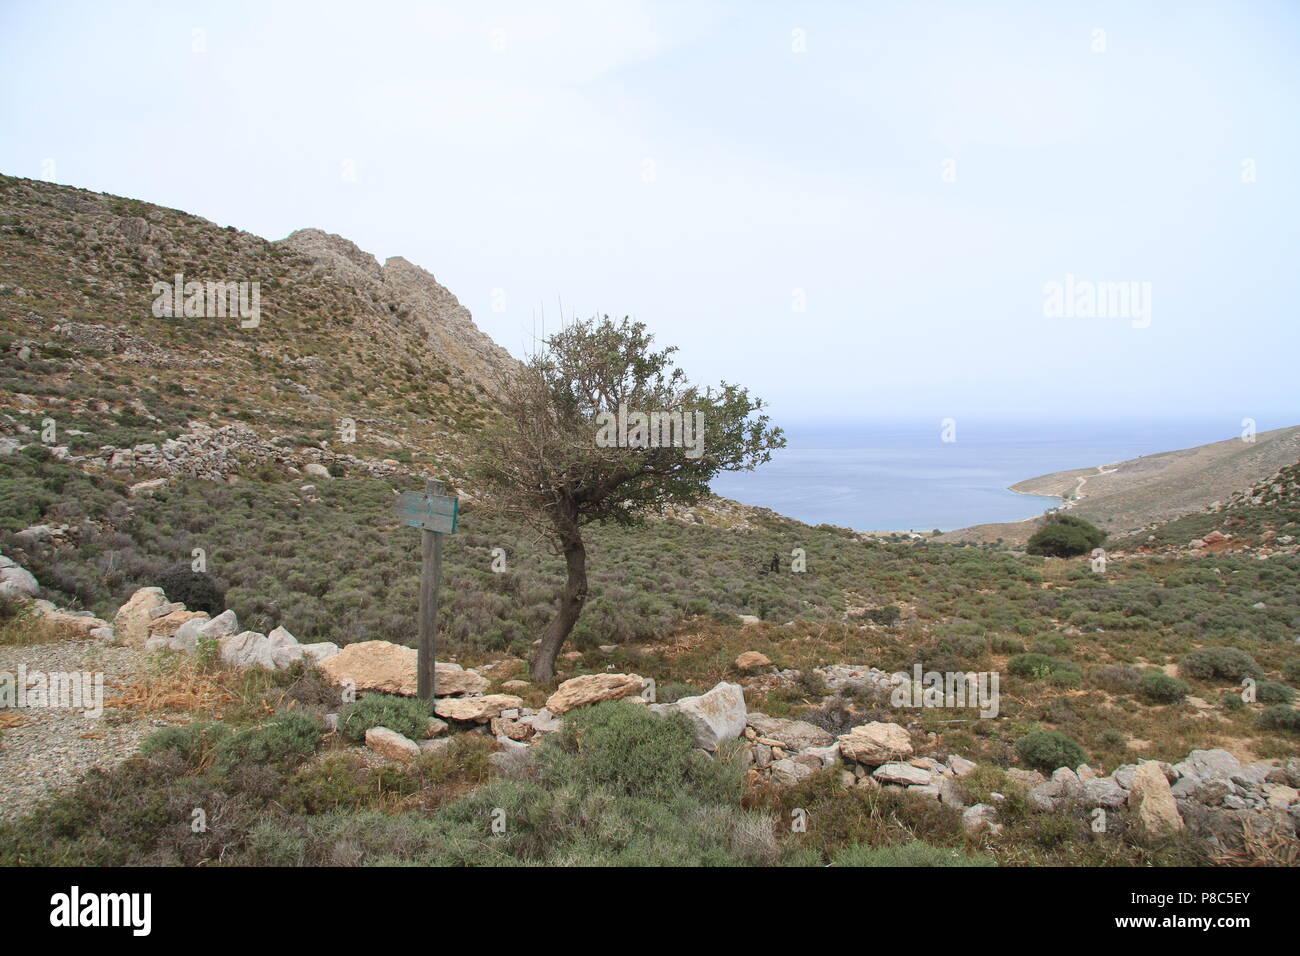 Wanderweg, Tilos, Griechenland Stockbild